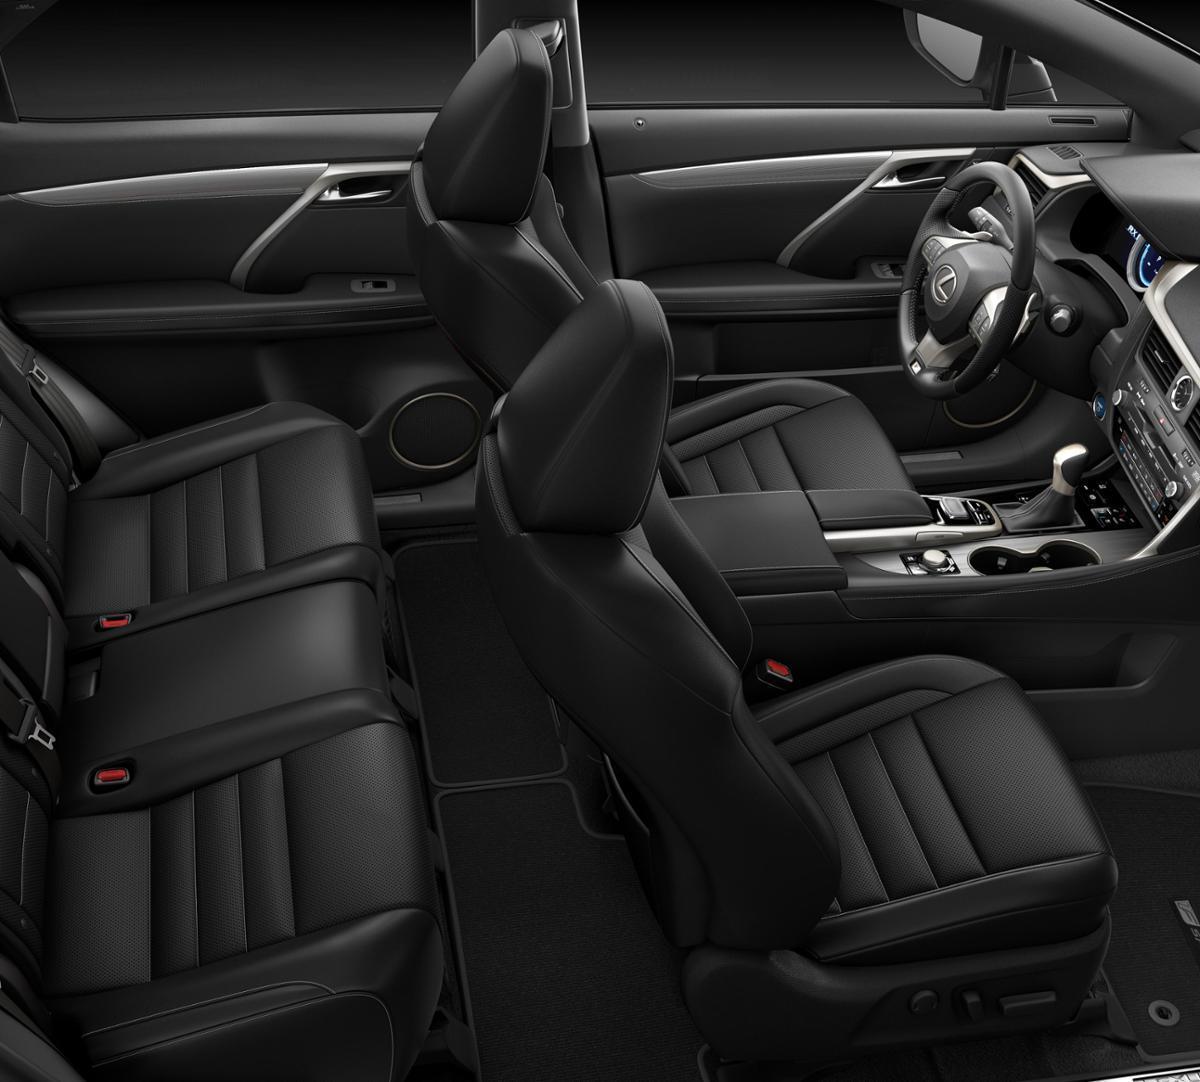 Ontario New 2018 Lexus Rx 450h Matador Red Mica Suv For